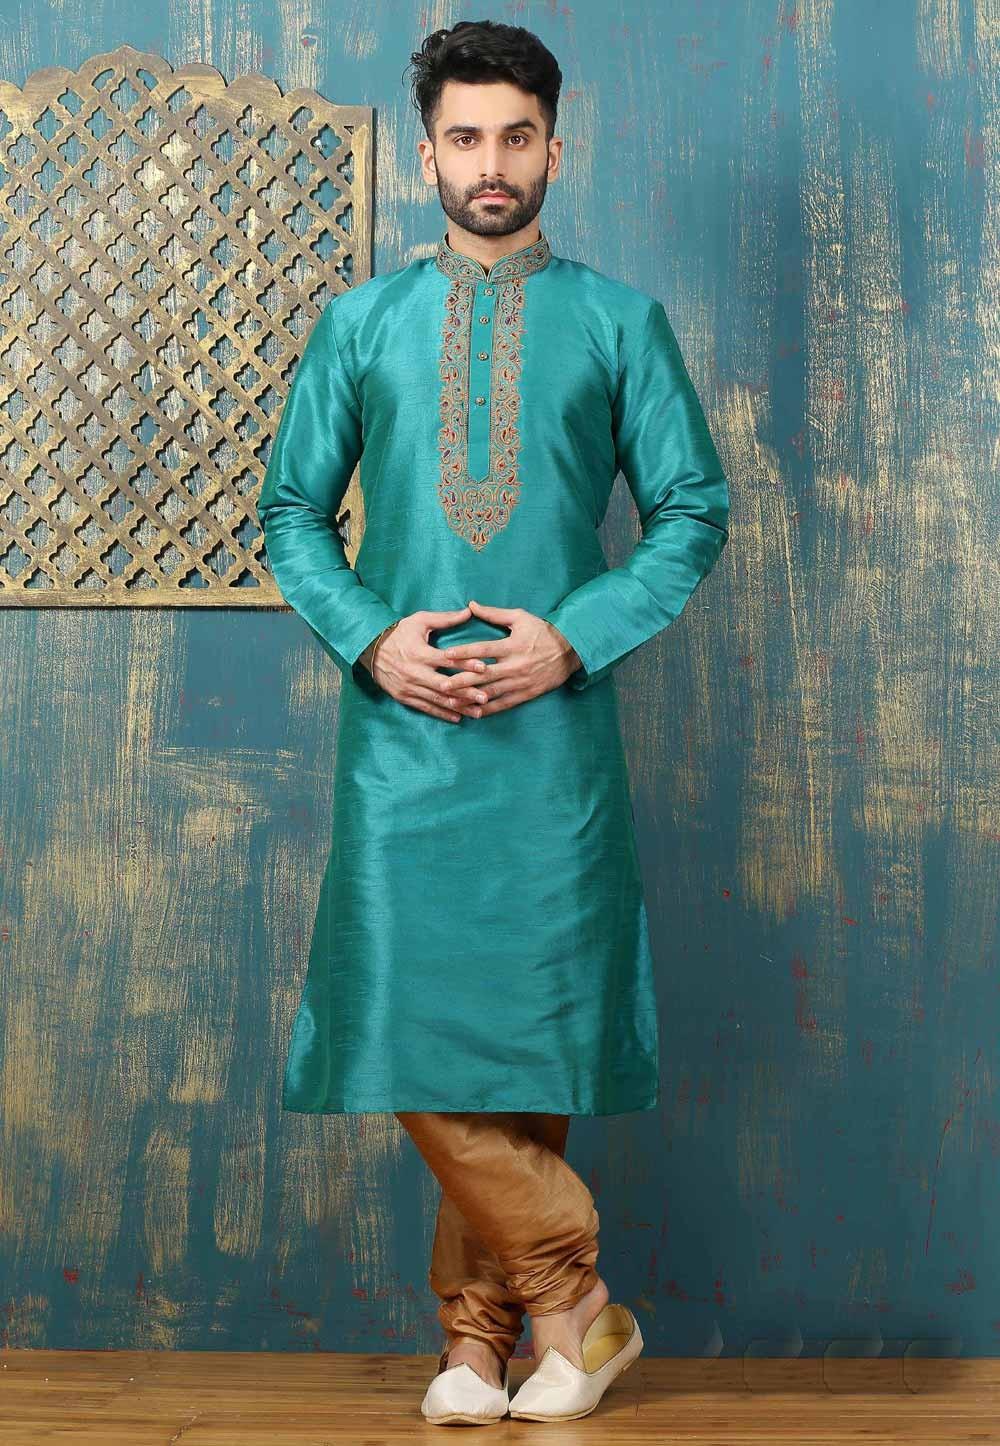 Men's Exquisite Green Color & Dupion Art Silk Readymade Kurta Pajama.